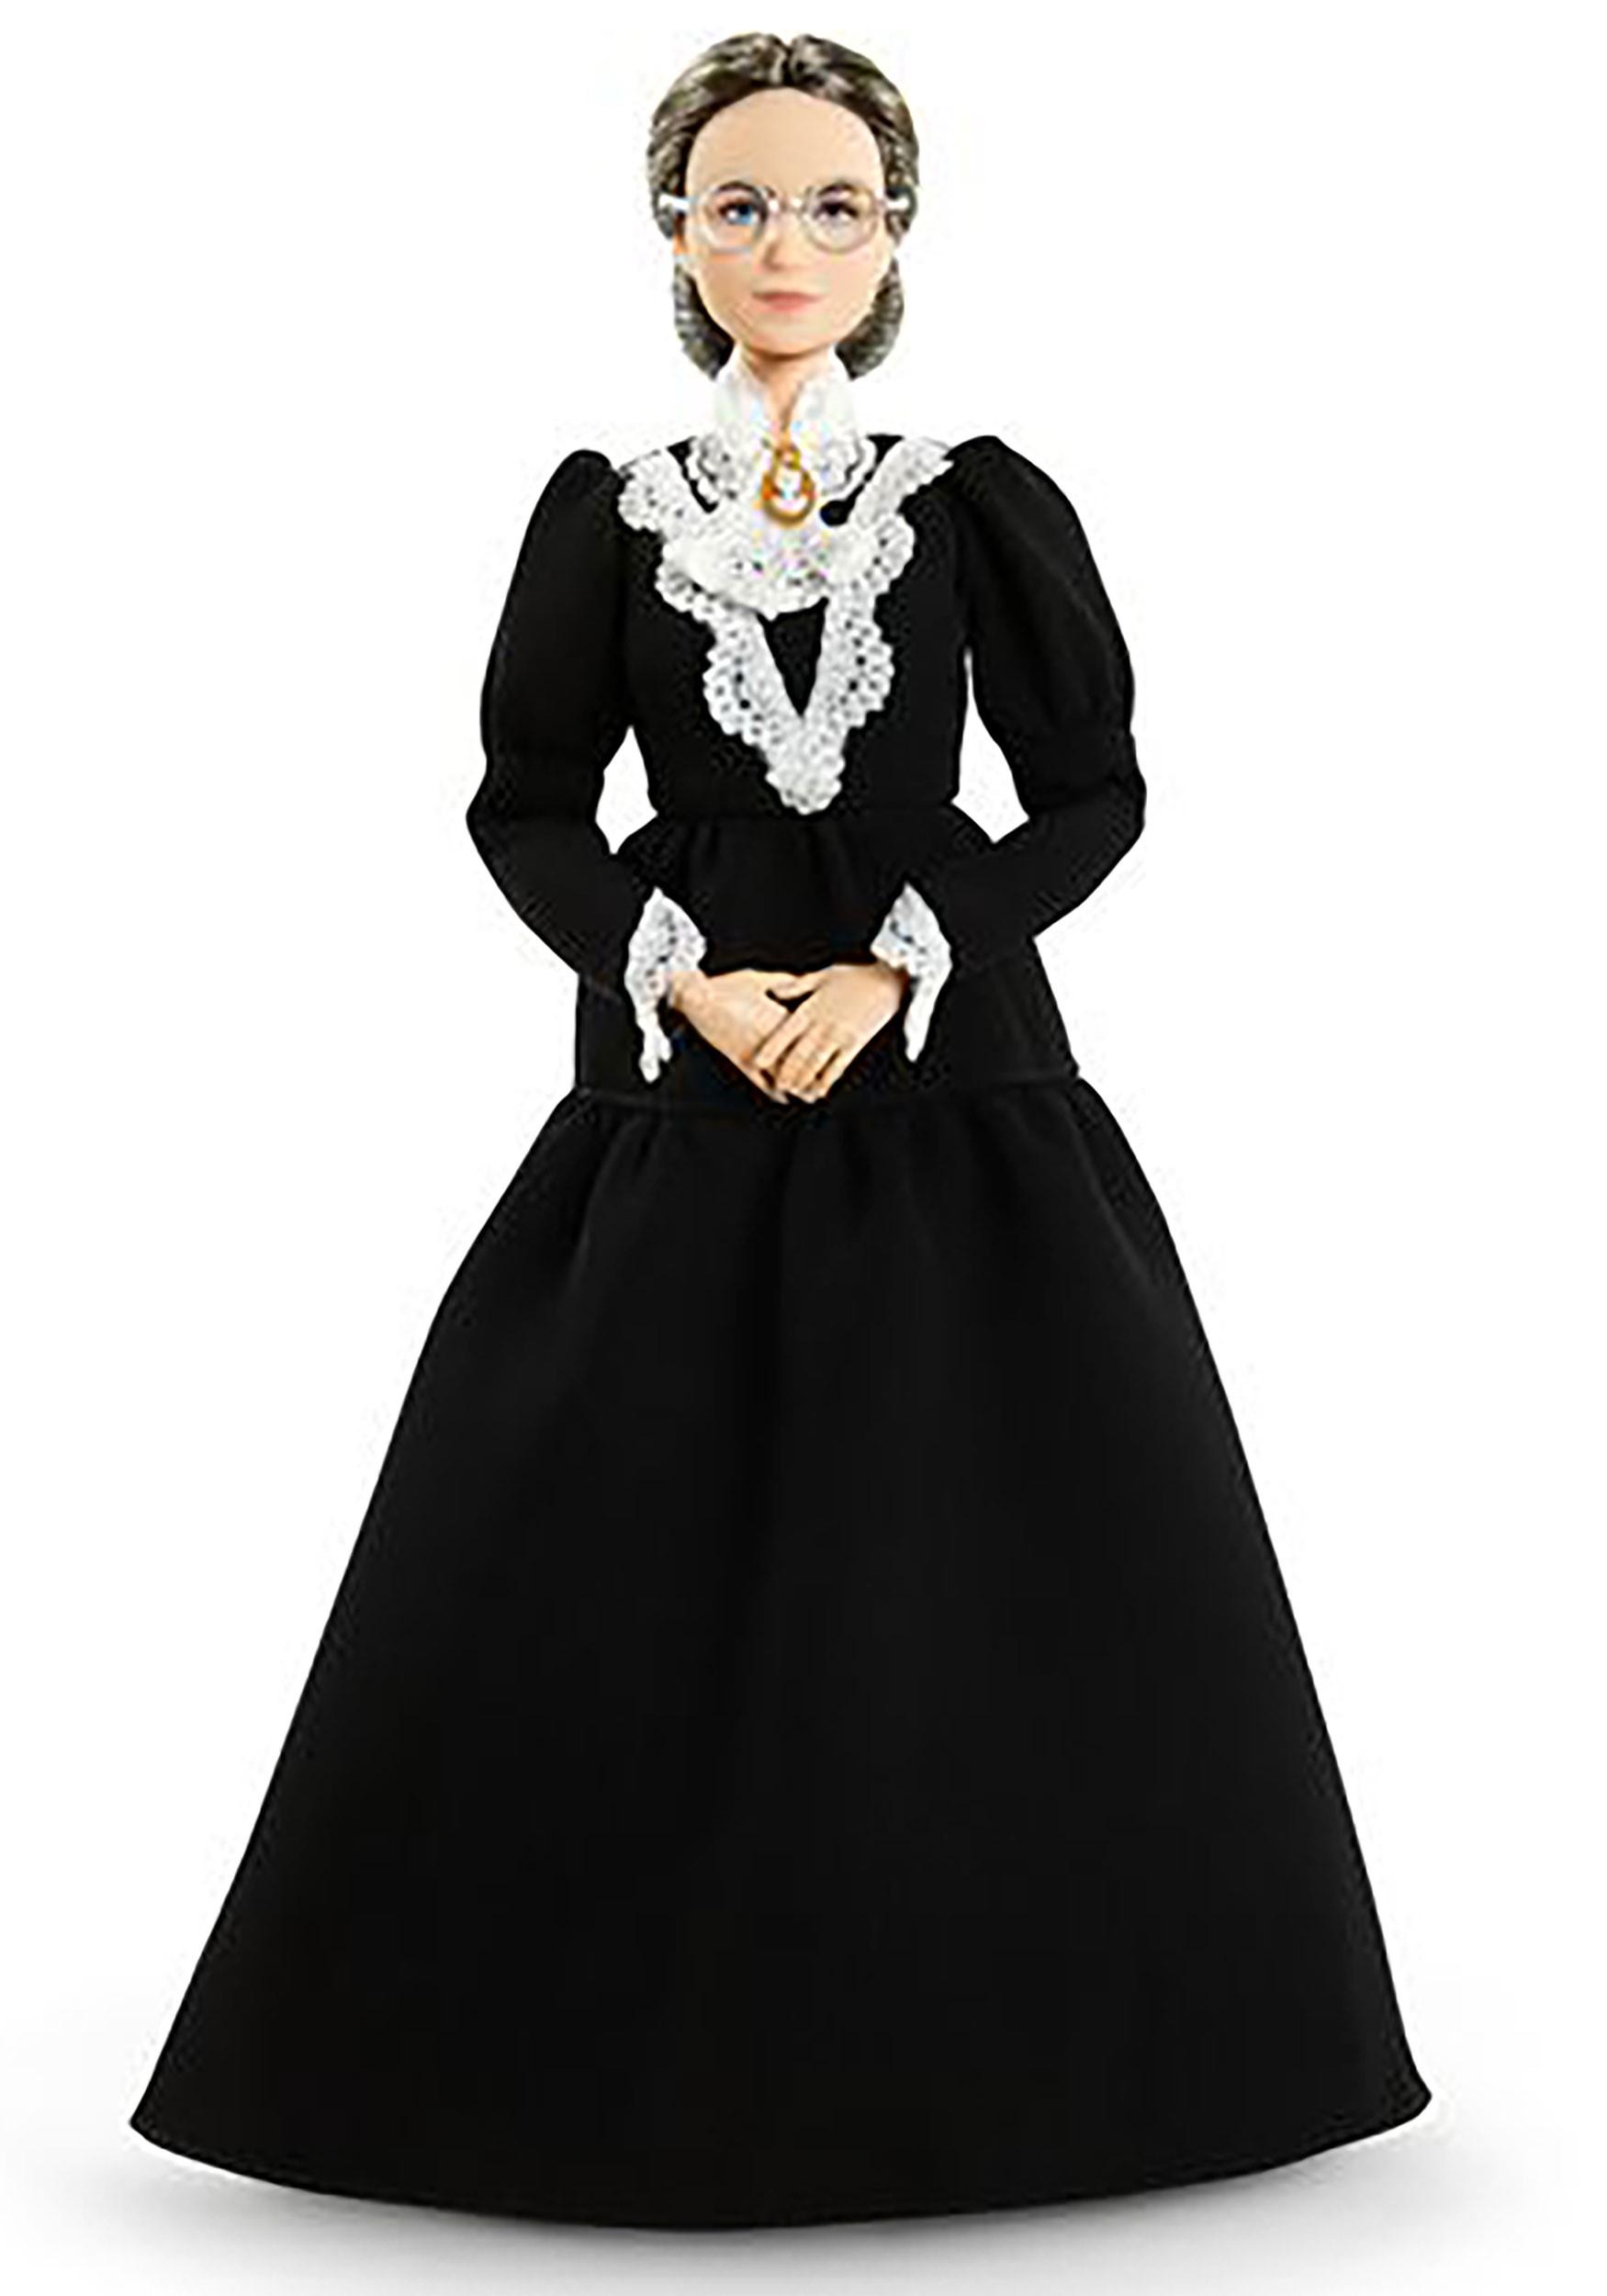 Barbie Inspiring Woman Susan B Anthony Doll